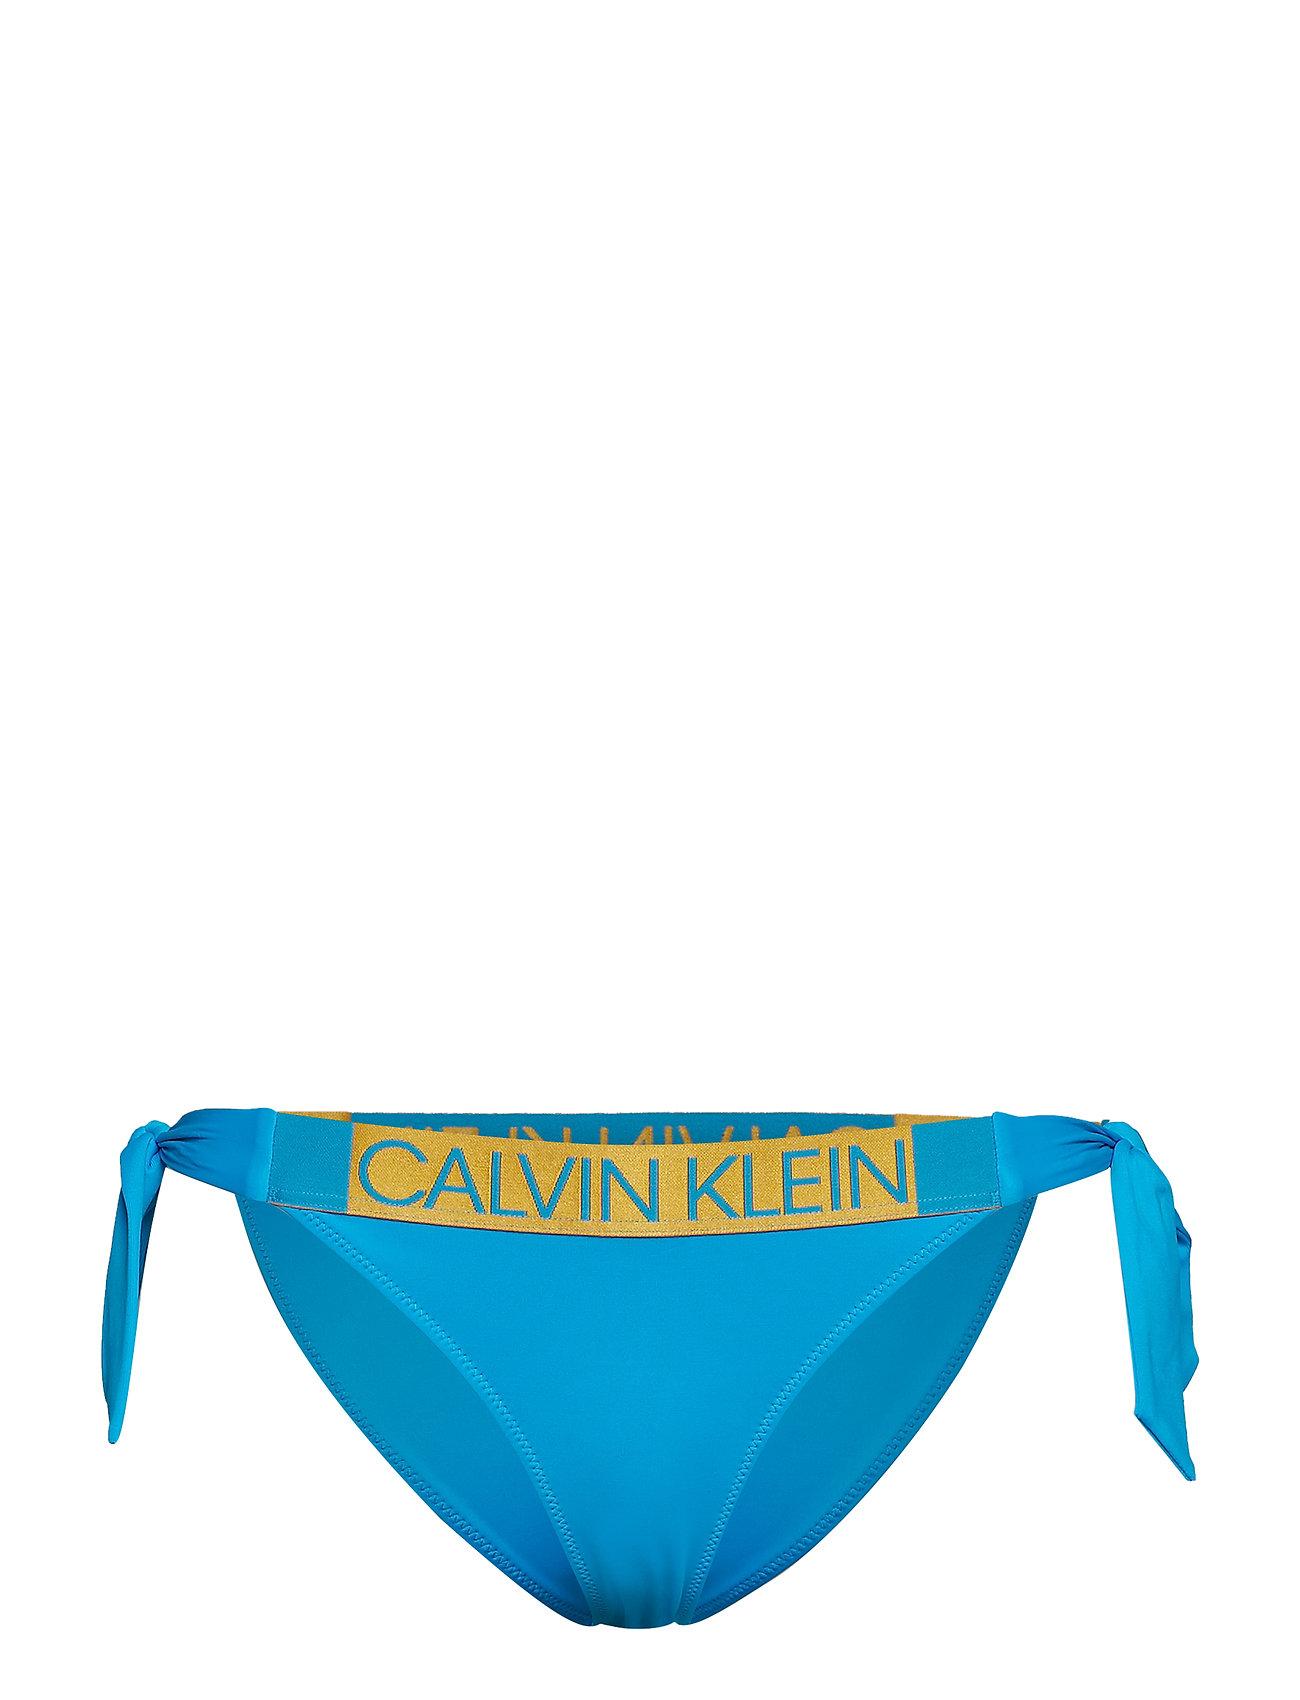 Calvin Klein CLASSIC SIDE TIE BIK - MALDIVE BLUE